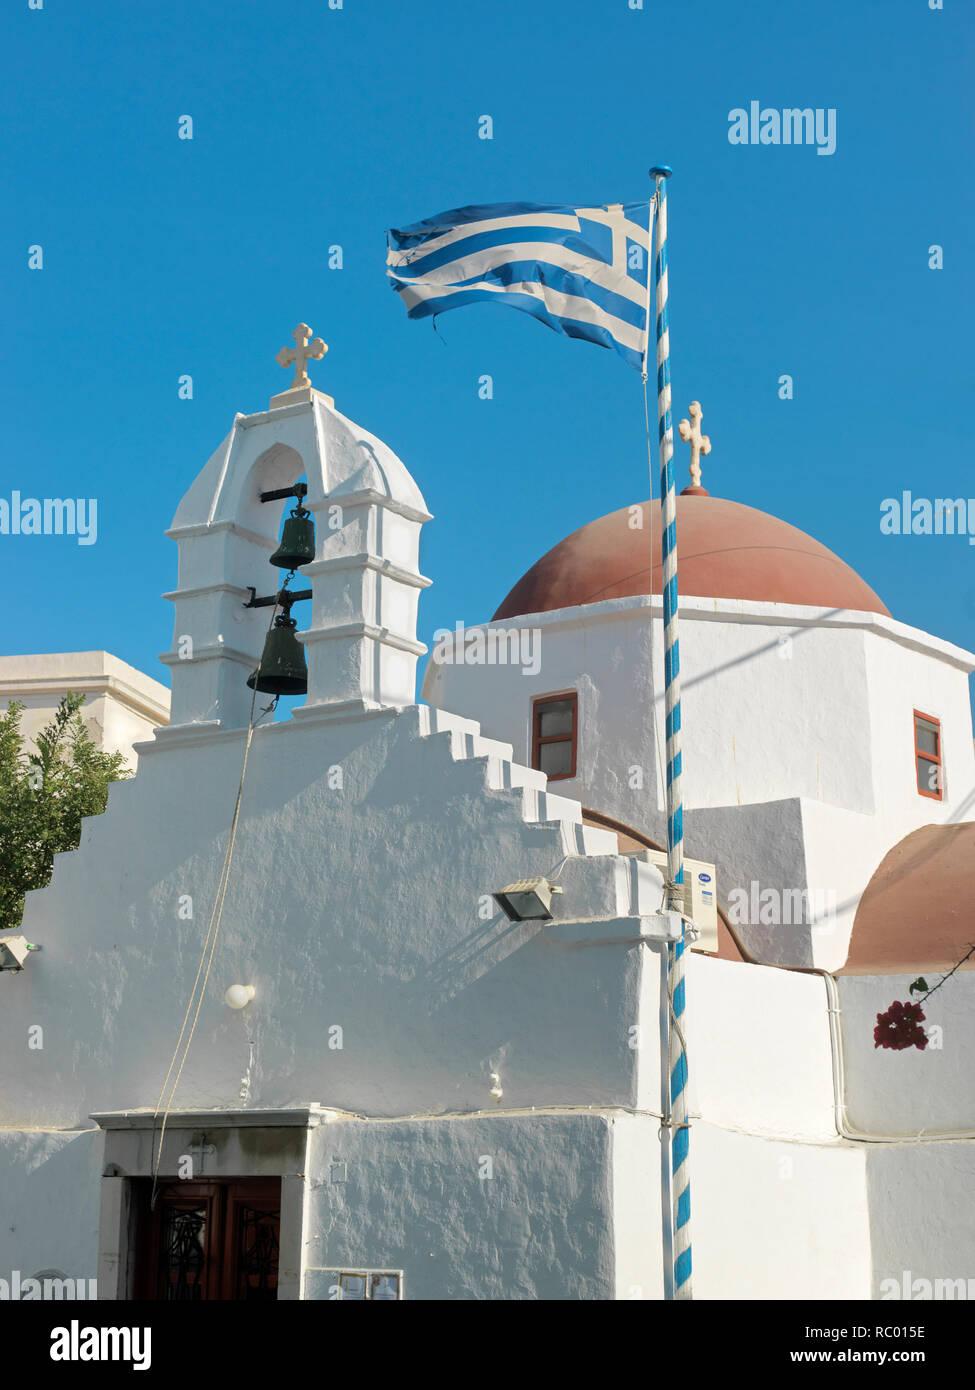 Kirche im Ort Mykonos, Insel Mykonos, Ägäisches Meer, Griechenland, Europa | church in Mykonos town, Mykonos island, Agean Island, Greece, Europe, Mik - Stock Image